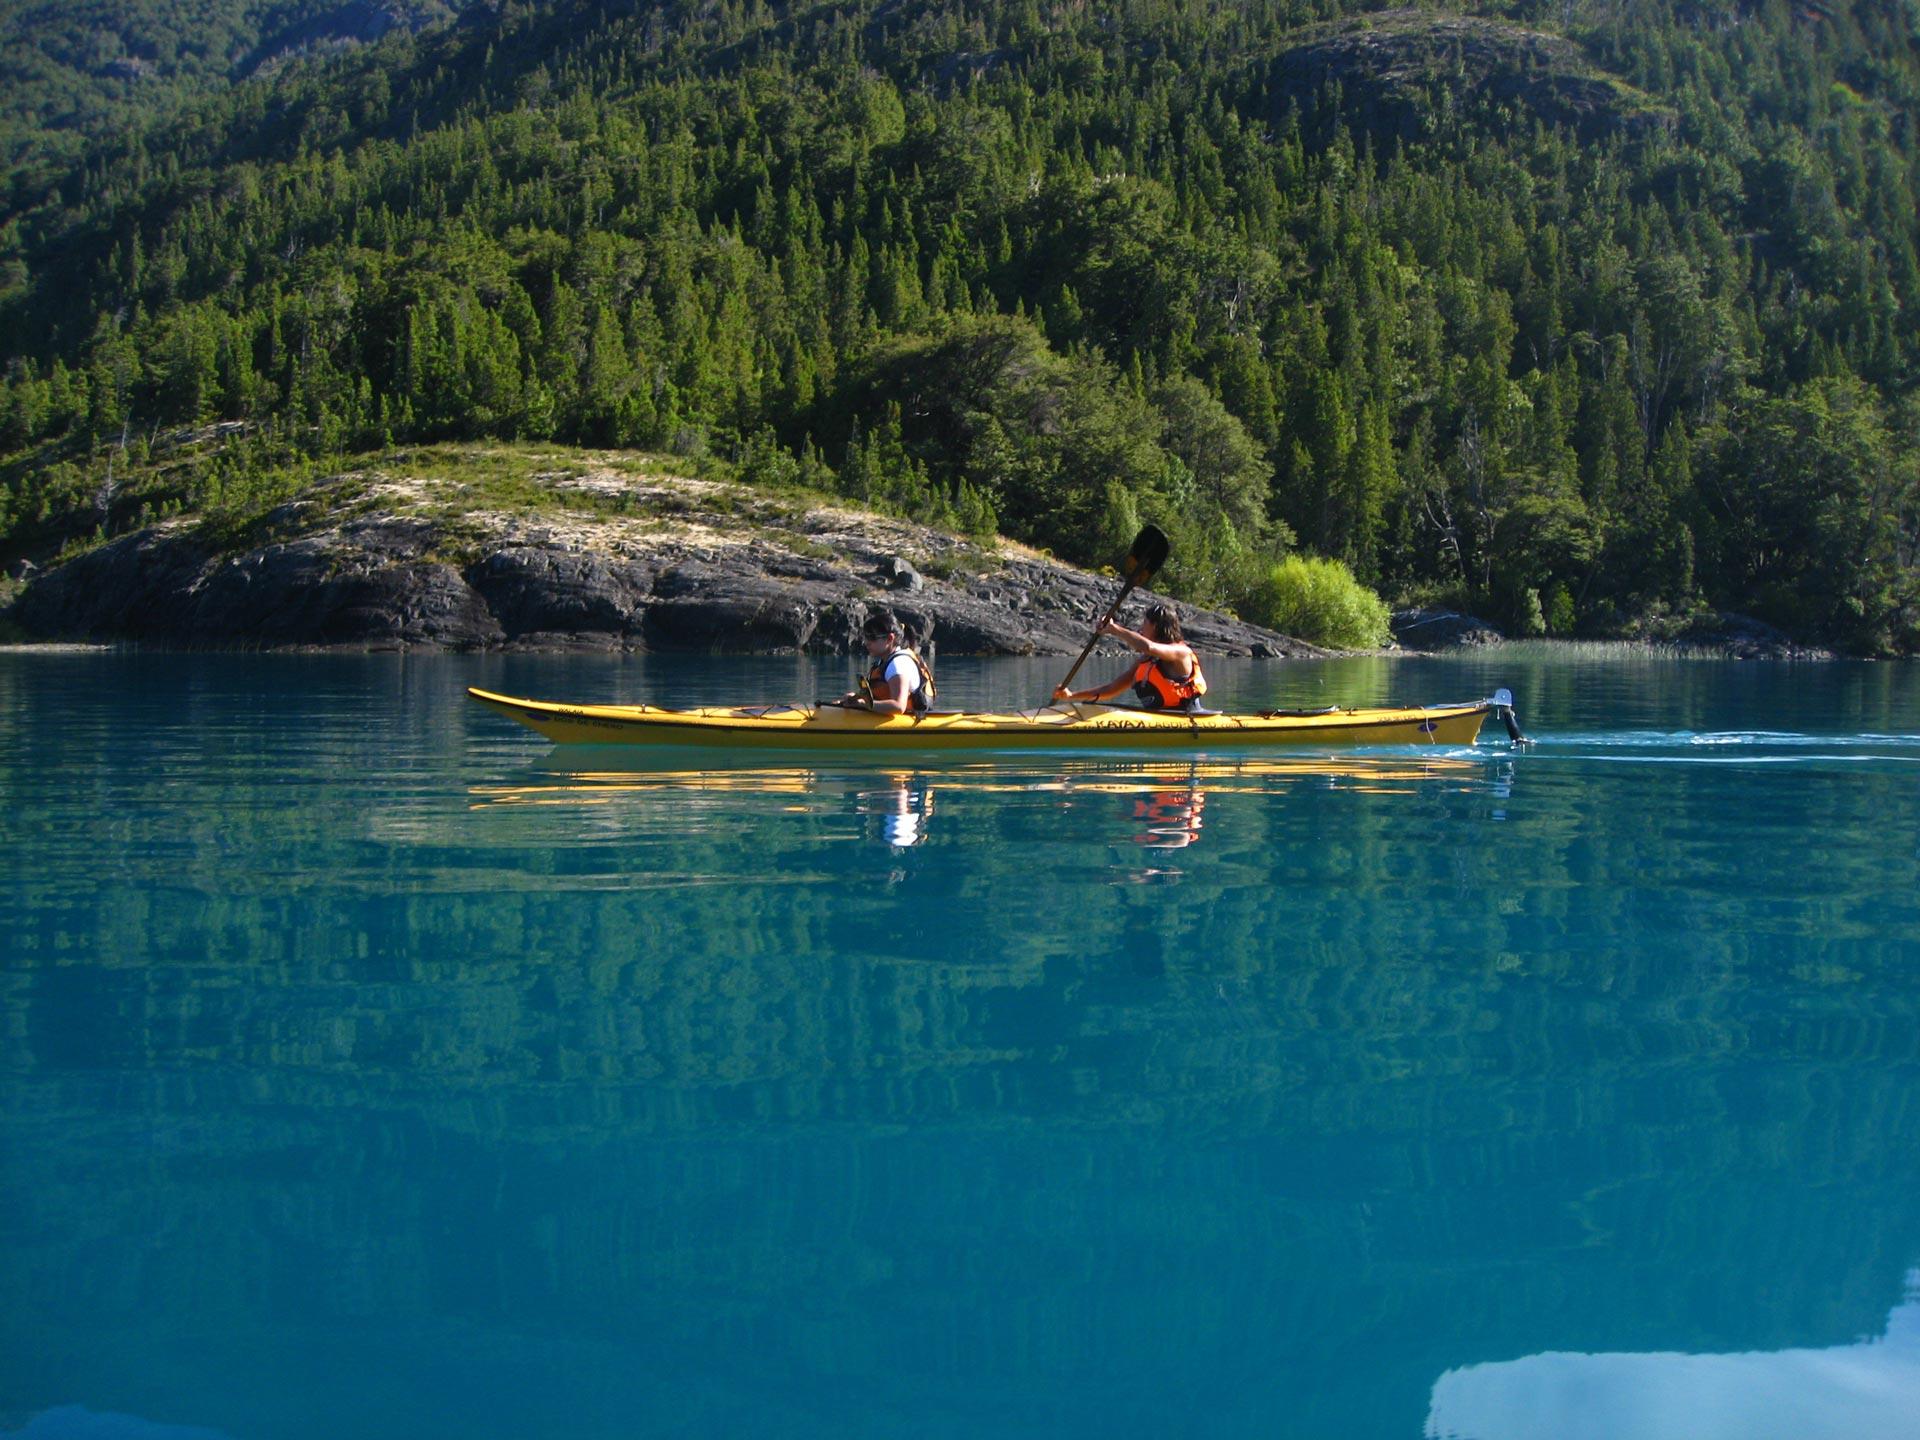 limite-con-chile-paseos-en-kayak-de-travesia